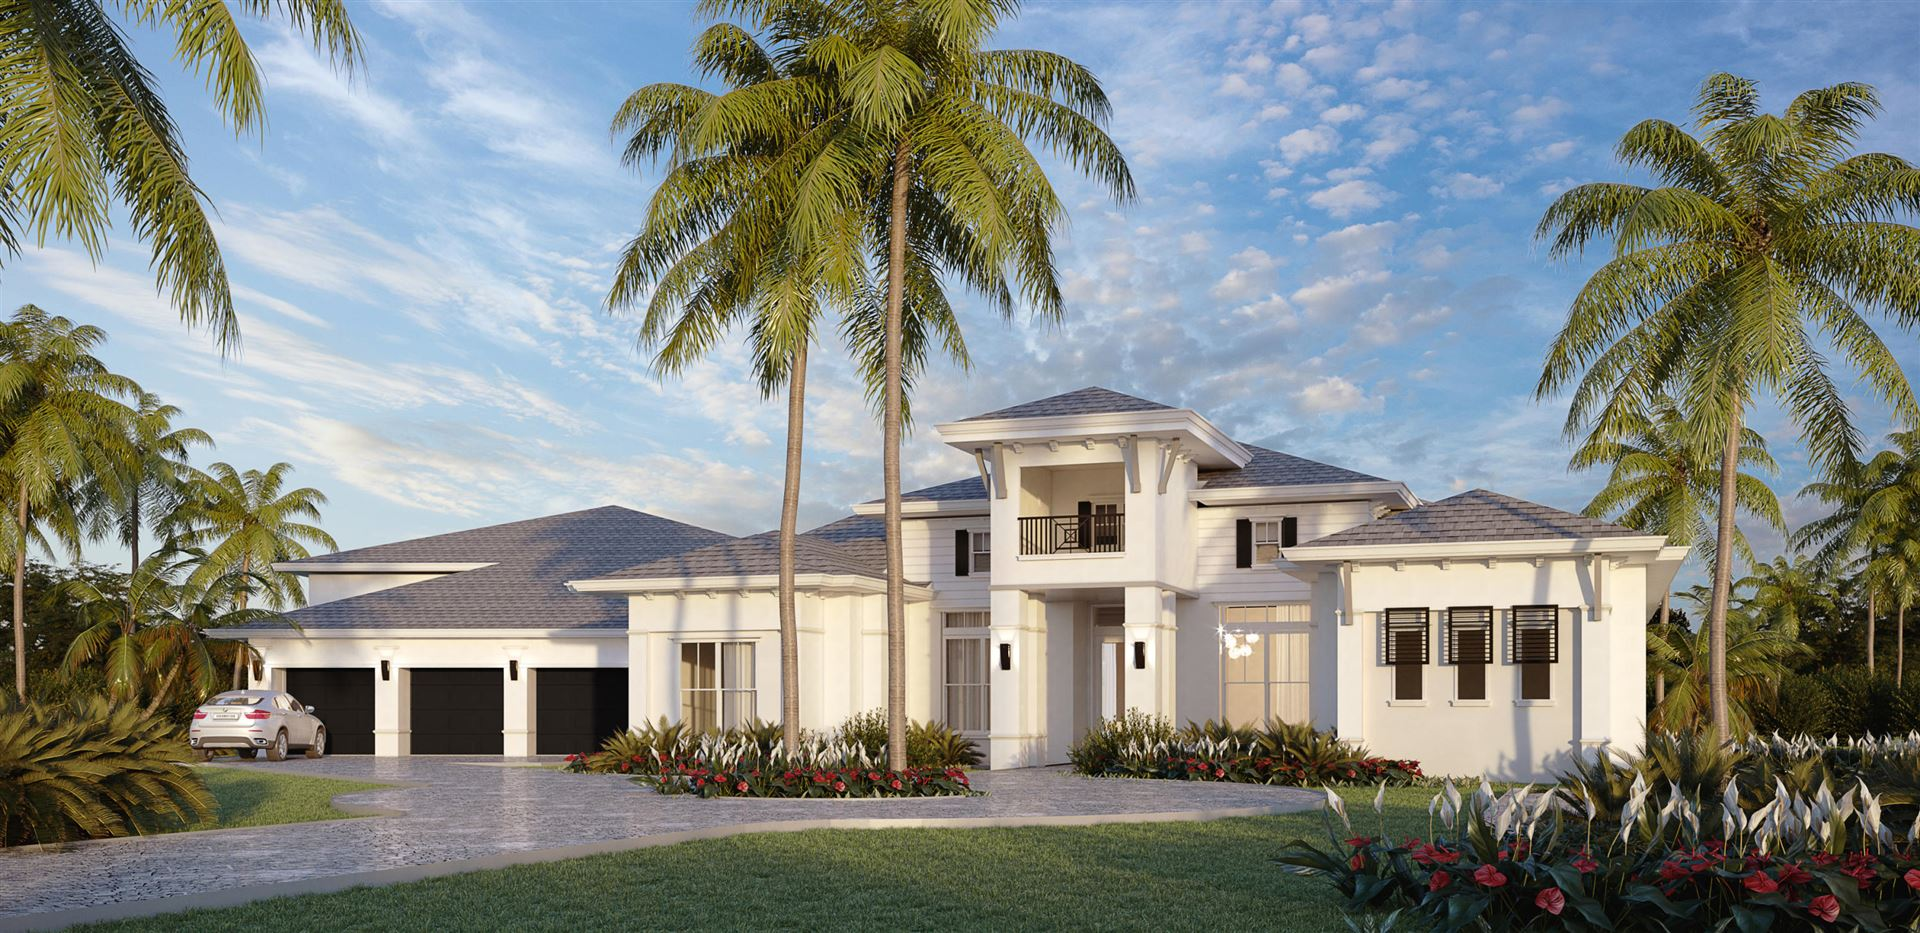 15355 Hawker Lane, Wellington, FL 33414 - MLS#: RX-10722071